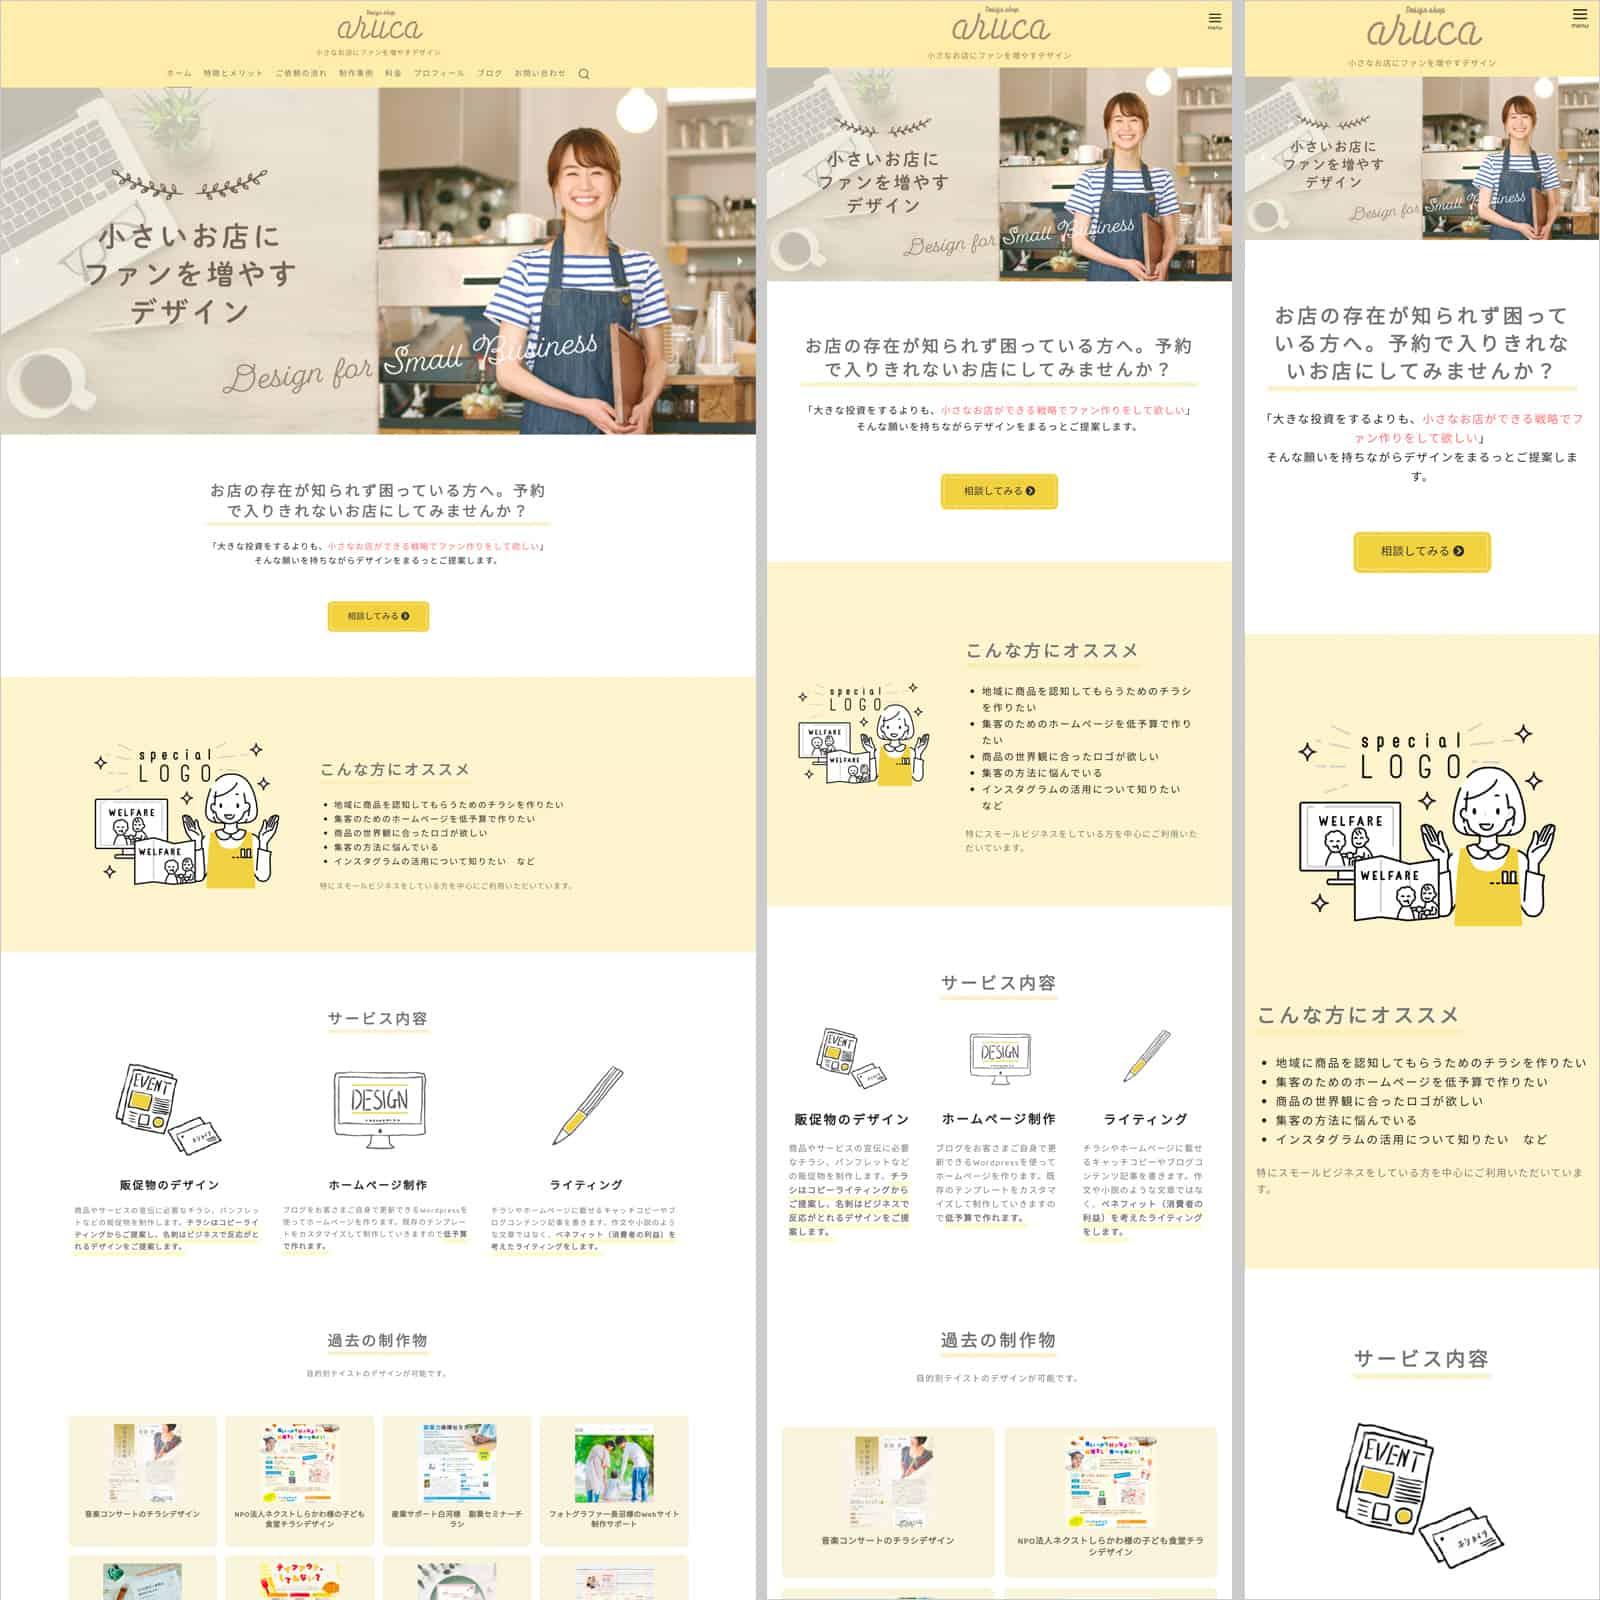 aruca design shop